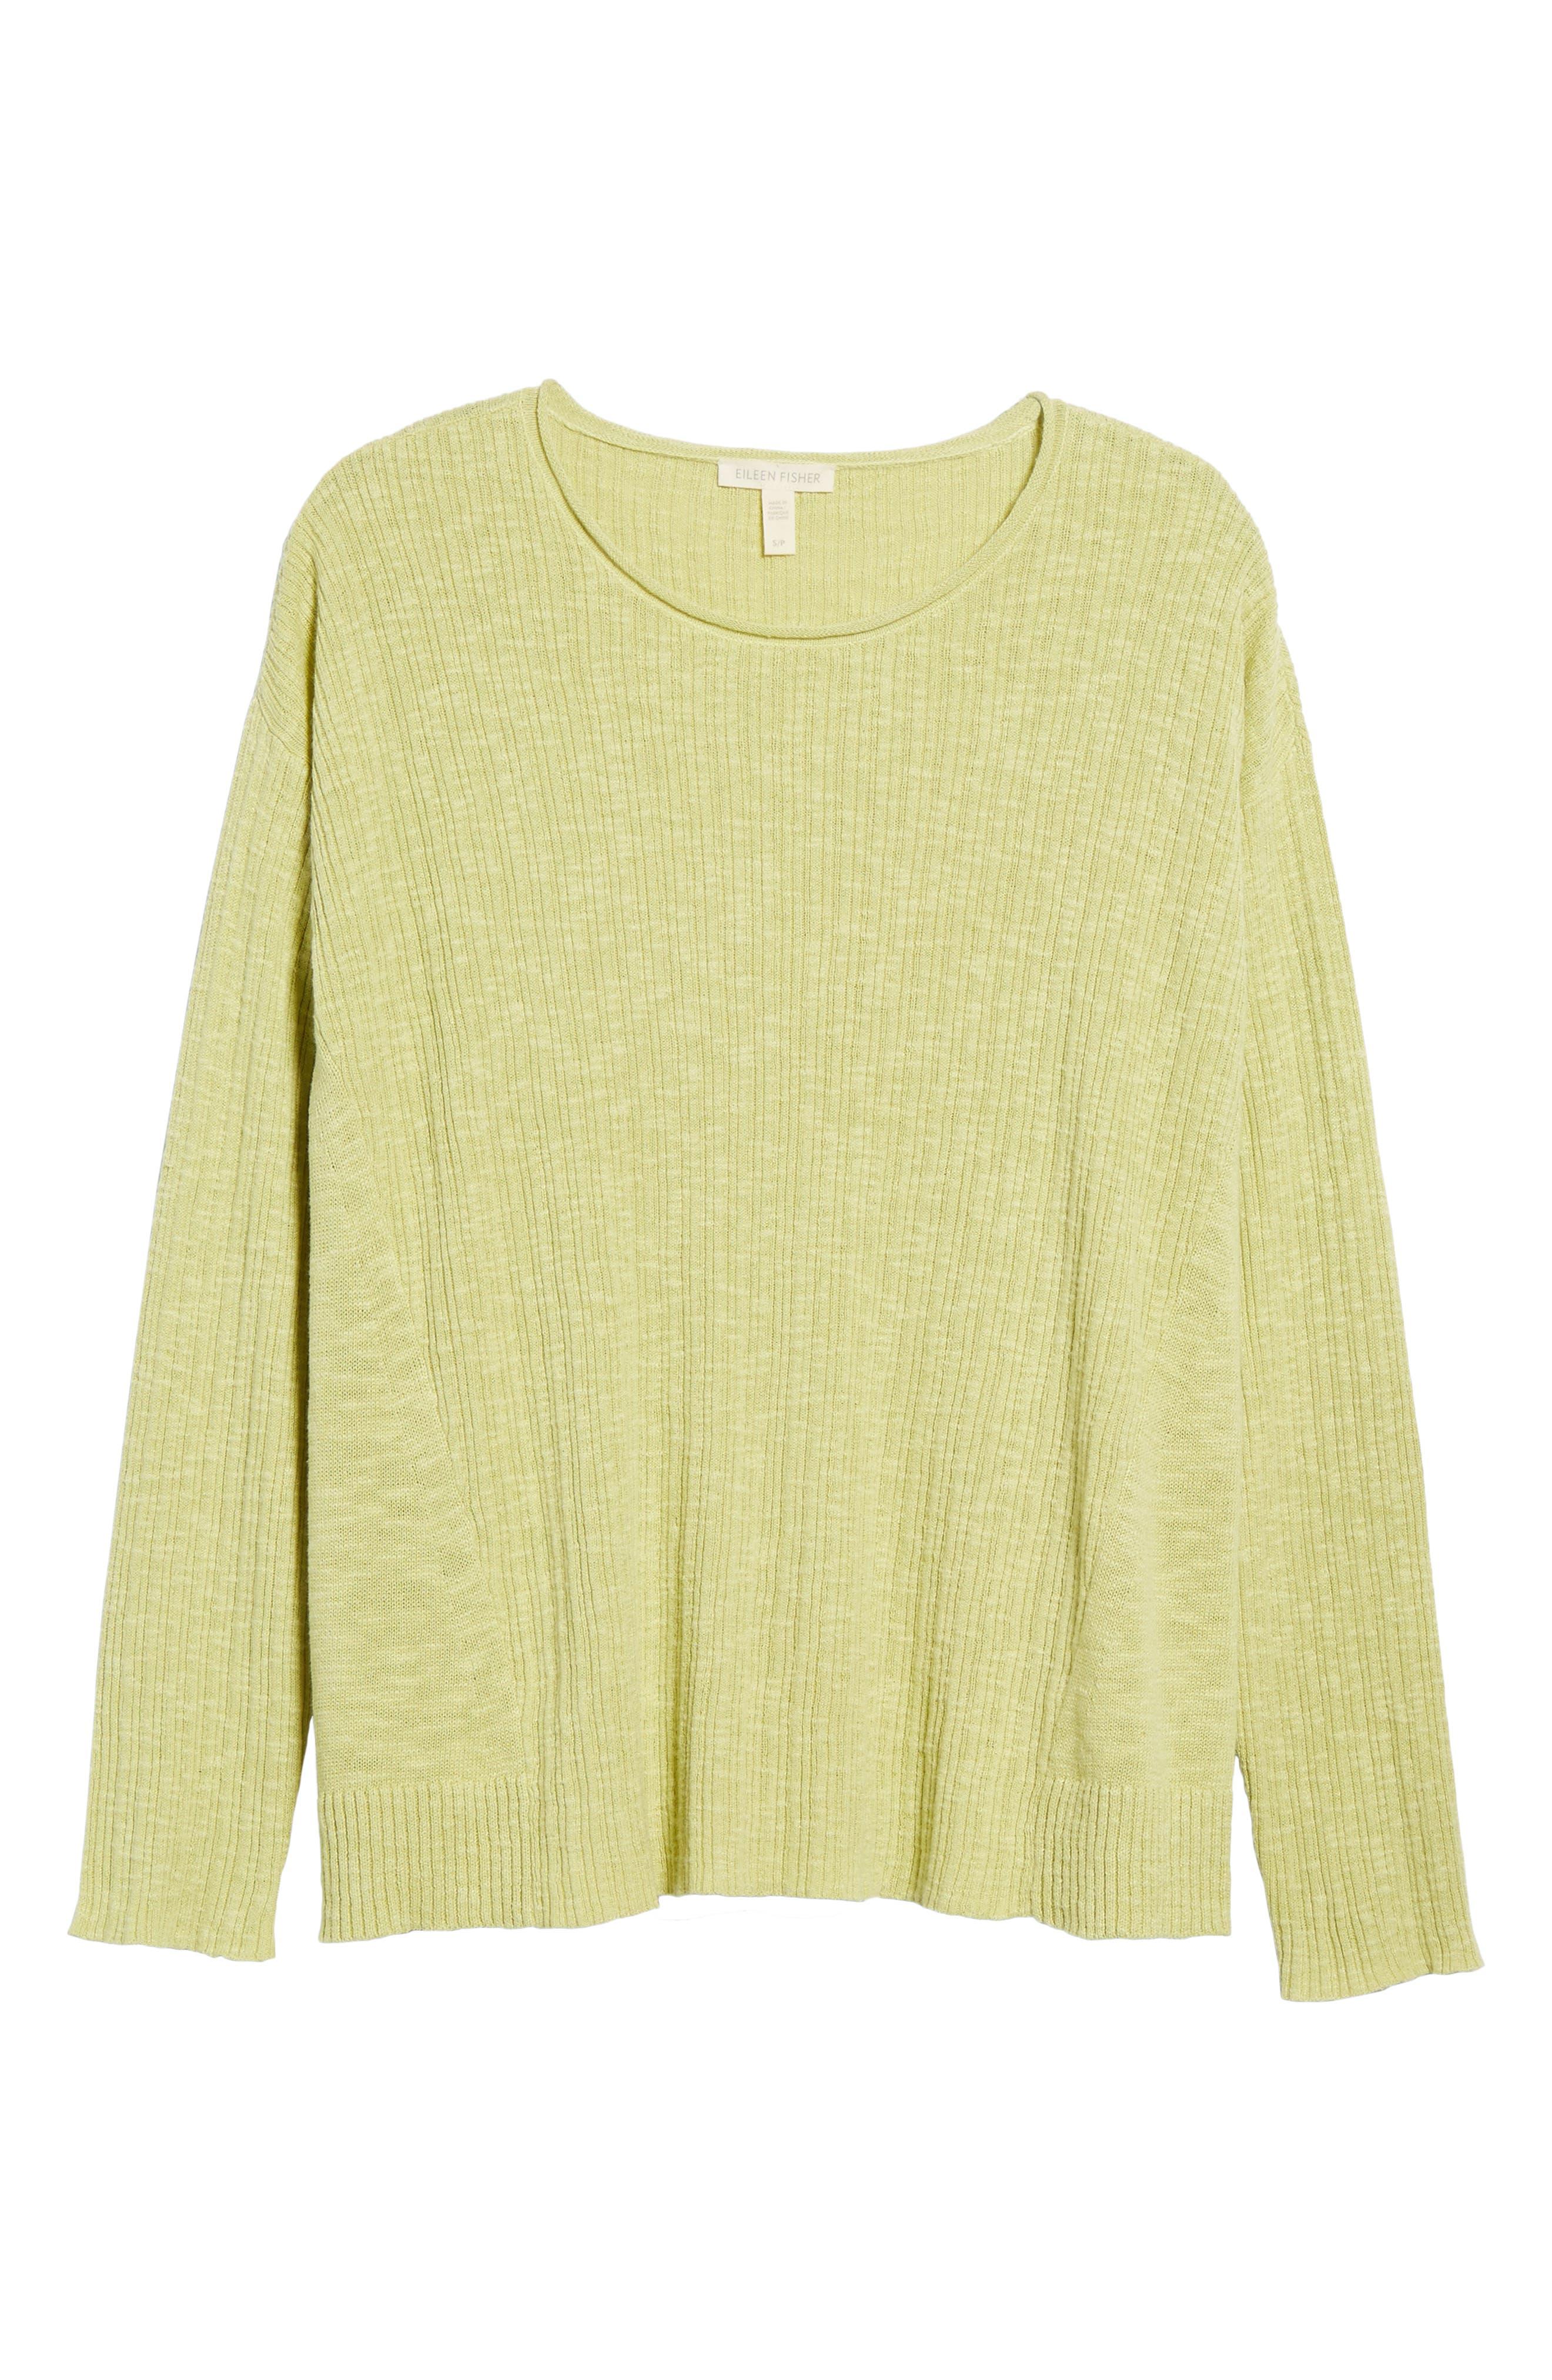 Organic Linen & Cotton Crewneck Sweater,                             Alternate thumbnail 29, color,